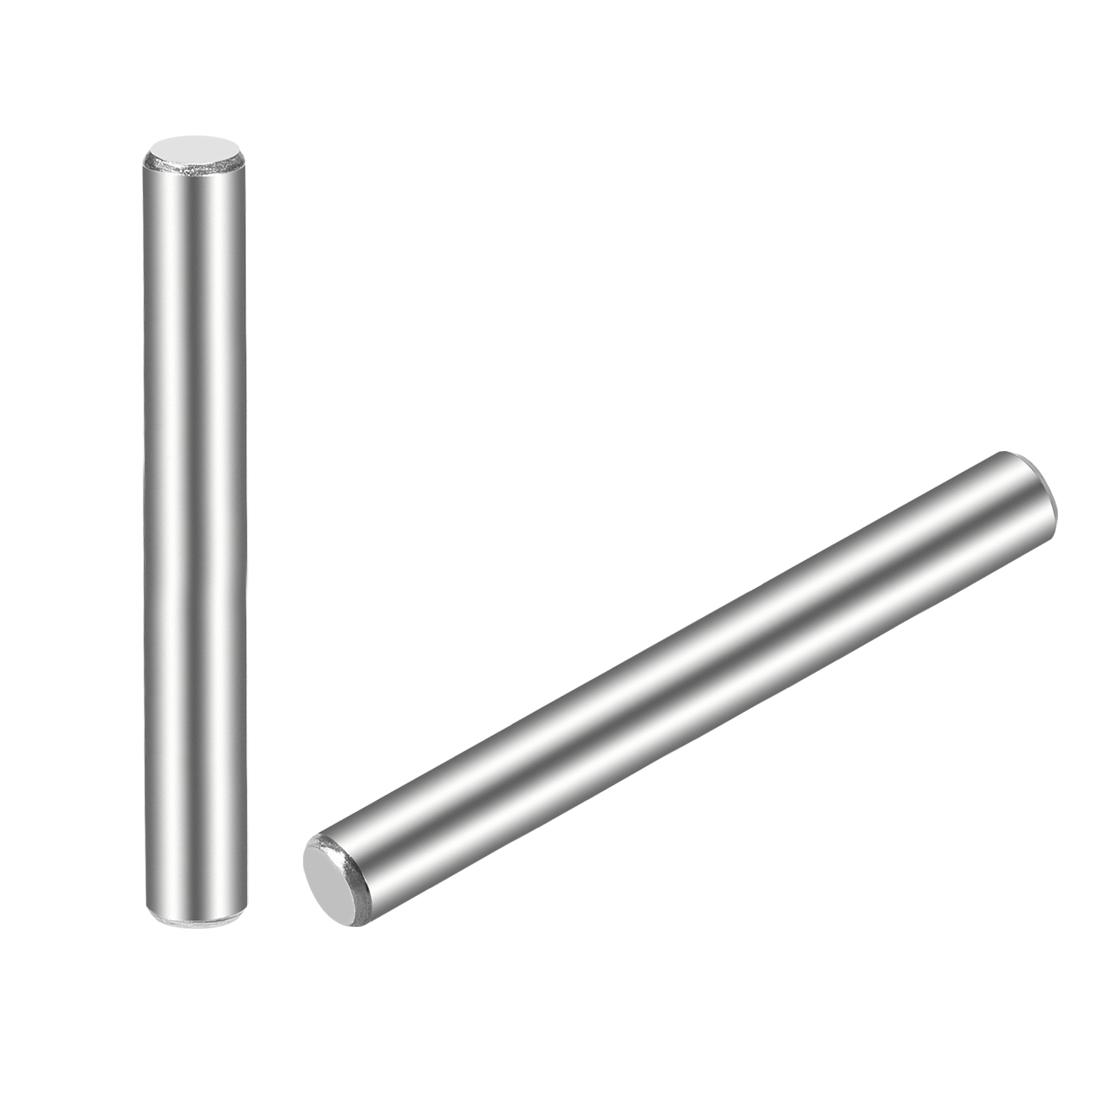 15Pcs 5mm x 60mm Dowel Pin 304 Stainless Steel Shelf Support Pin Fasten